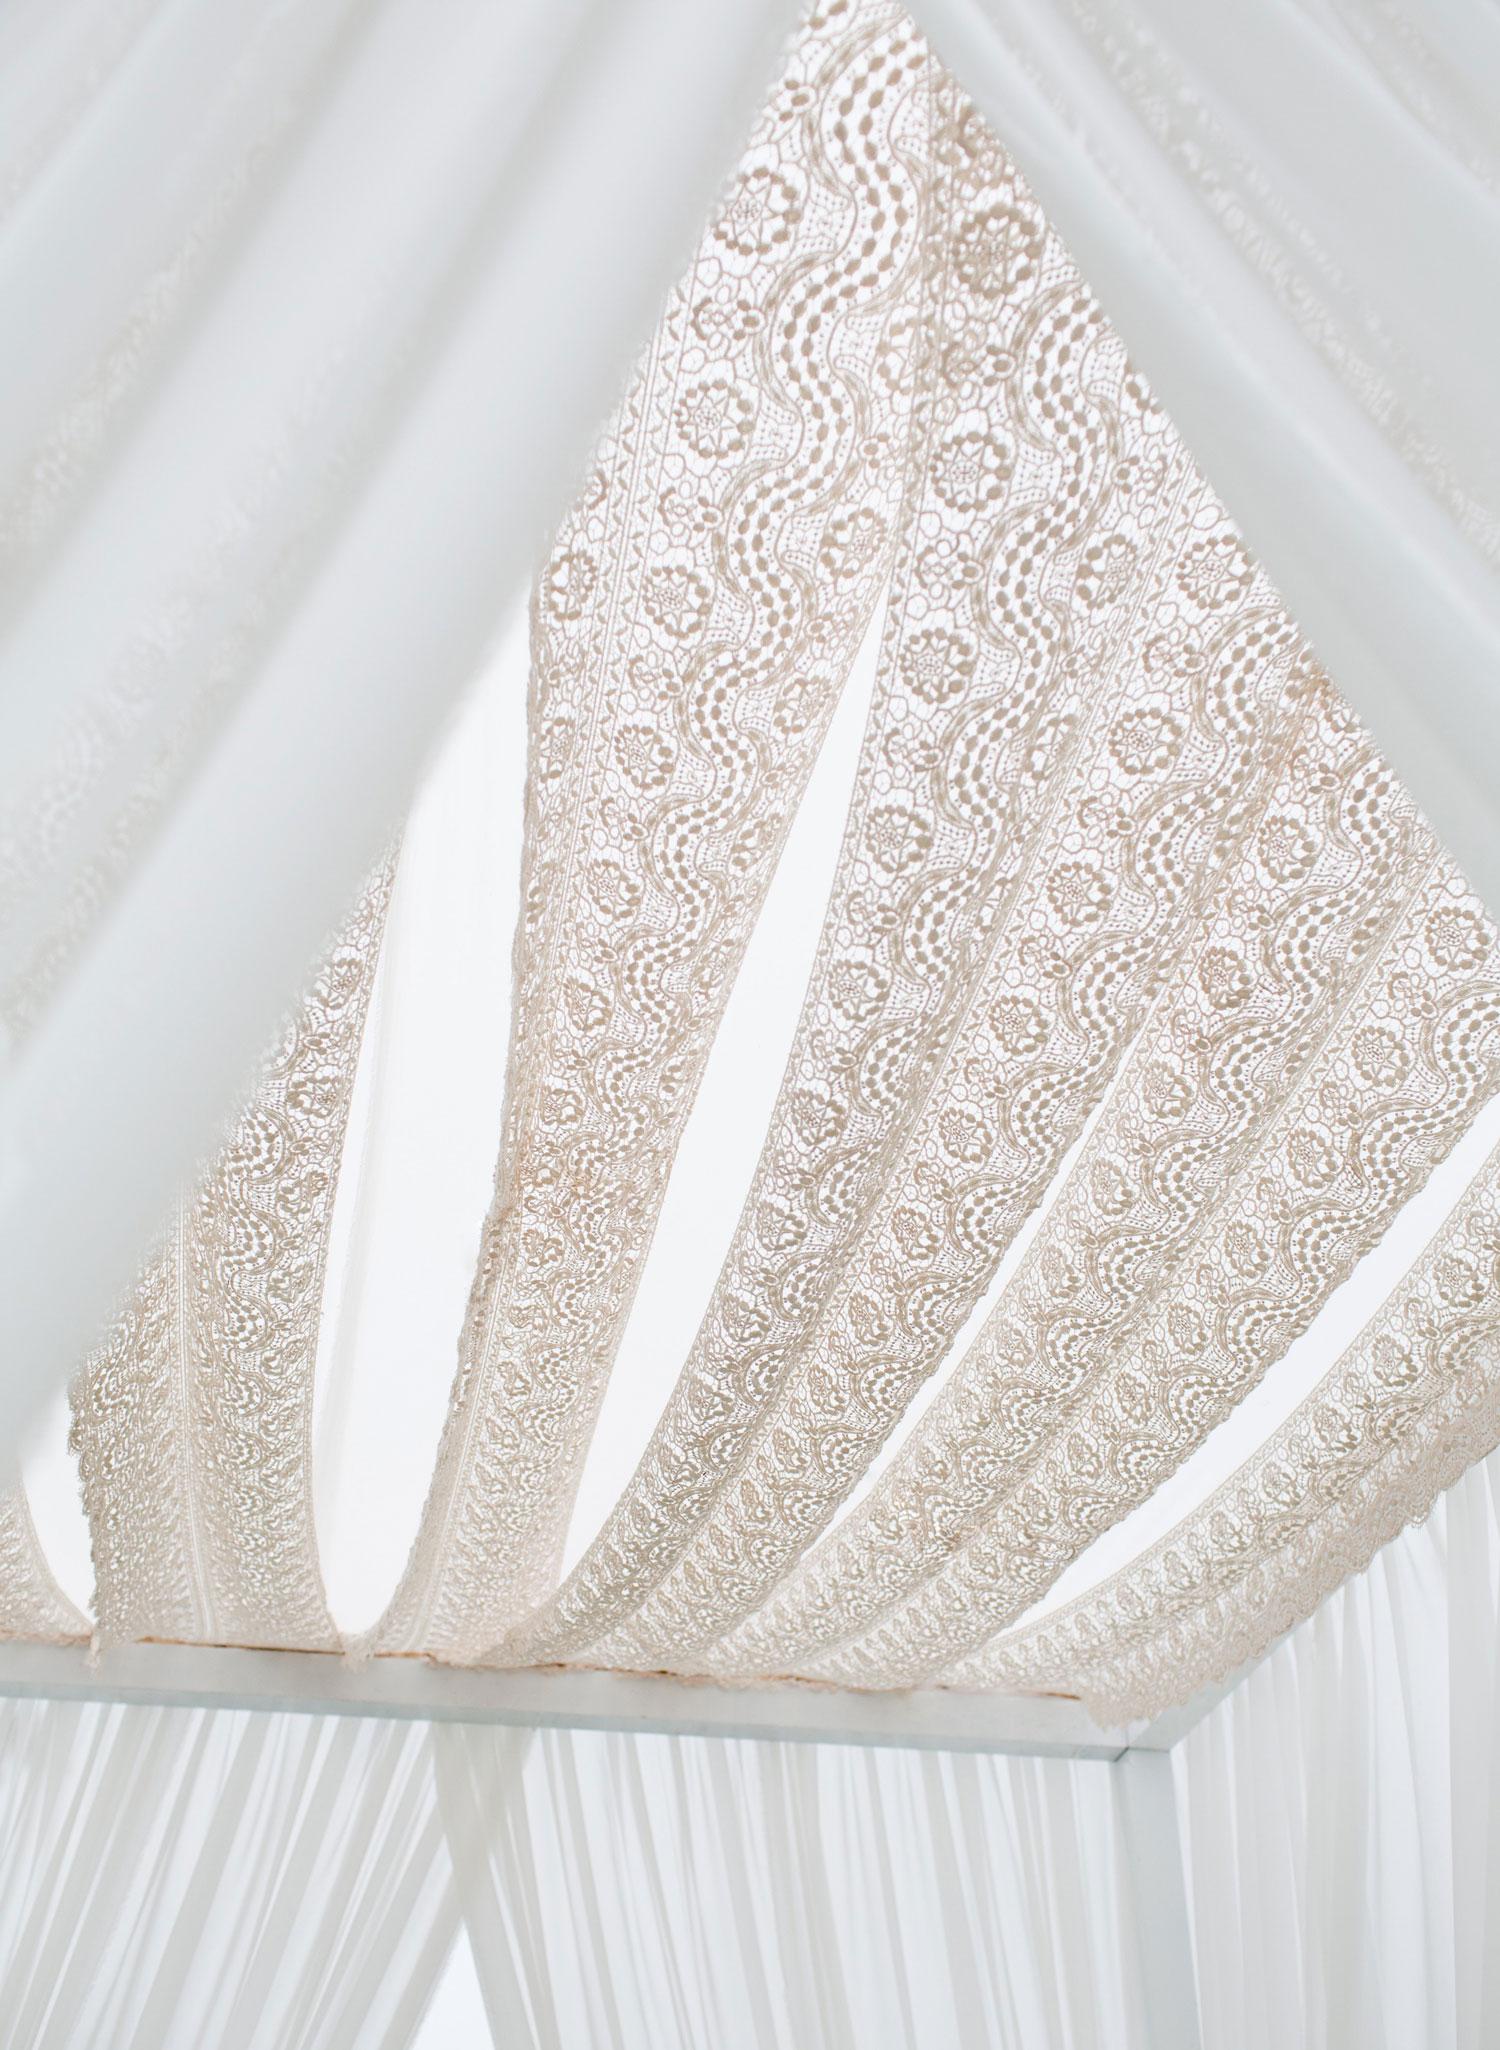 Lace chuppah ceremony canopy fabric drapery at wedding ceremony outdoor